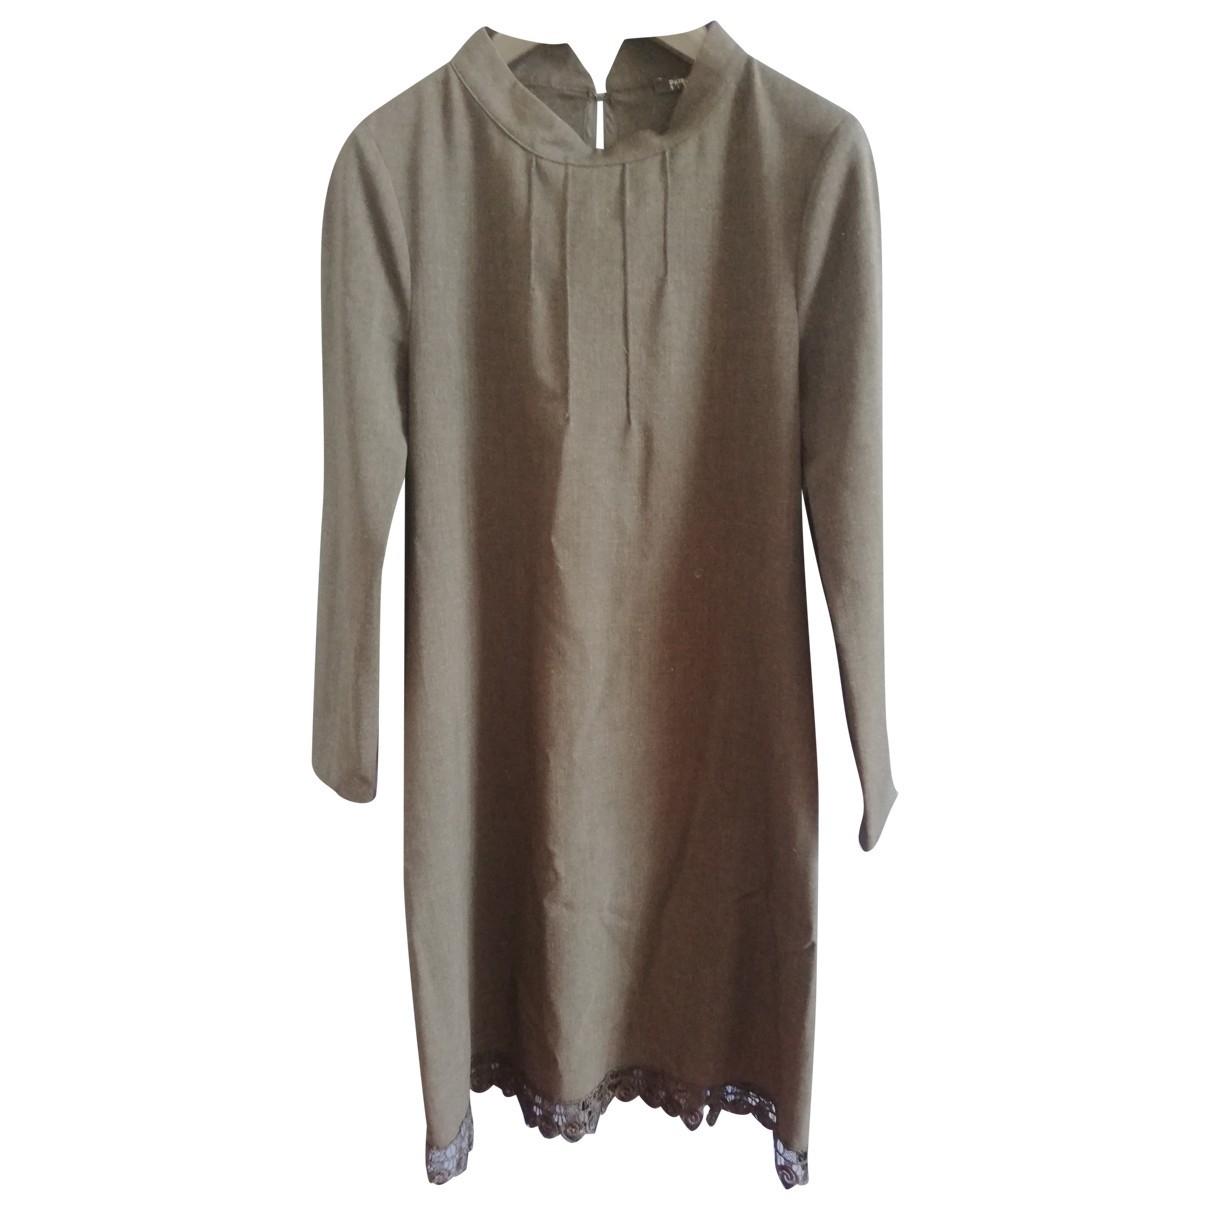 Patrizia Pepe \N Kleid in  Anthrazit Wolle